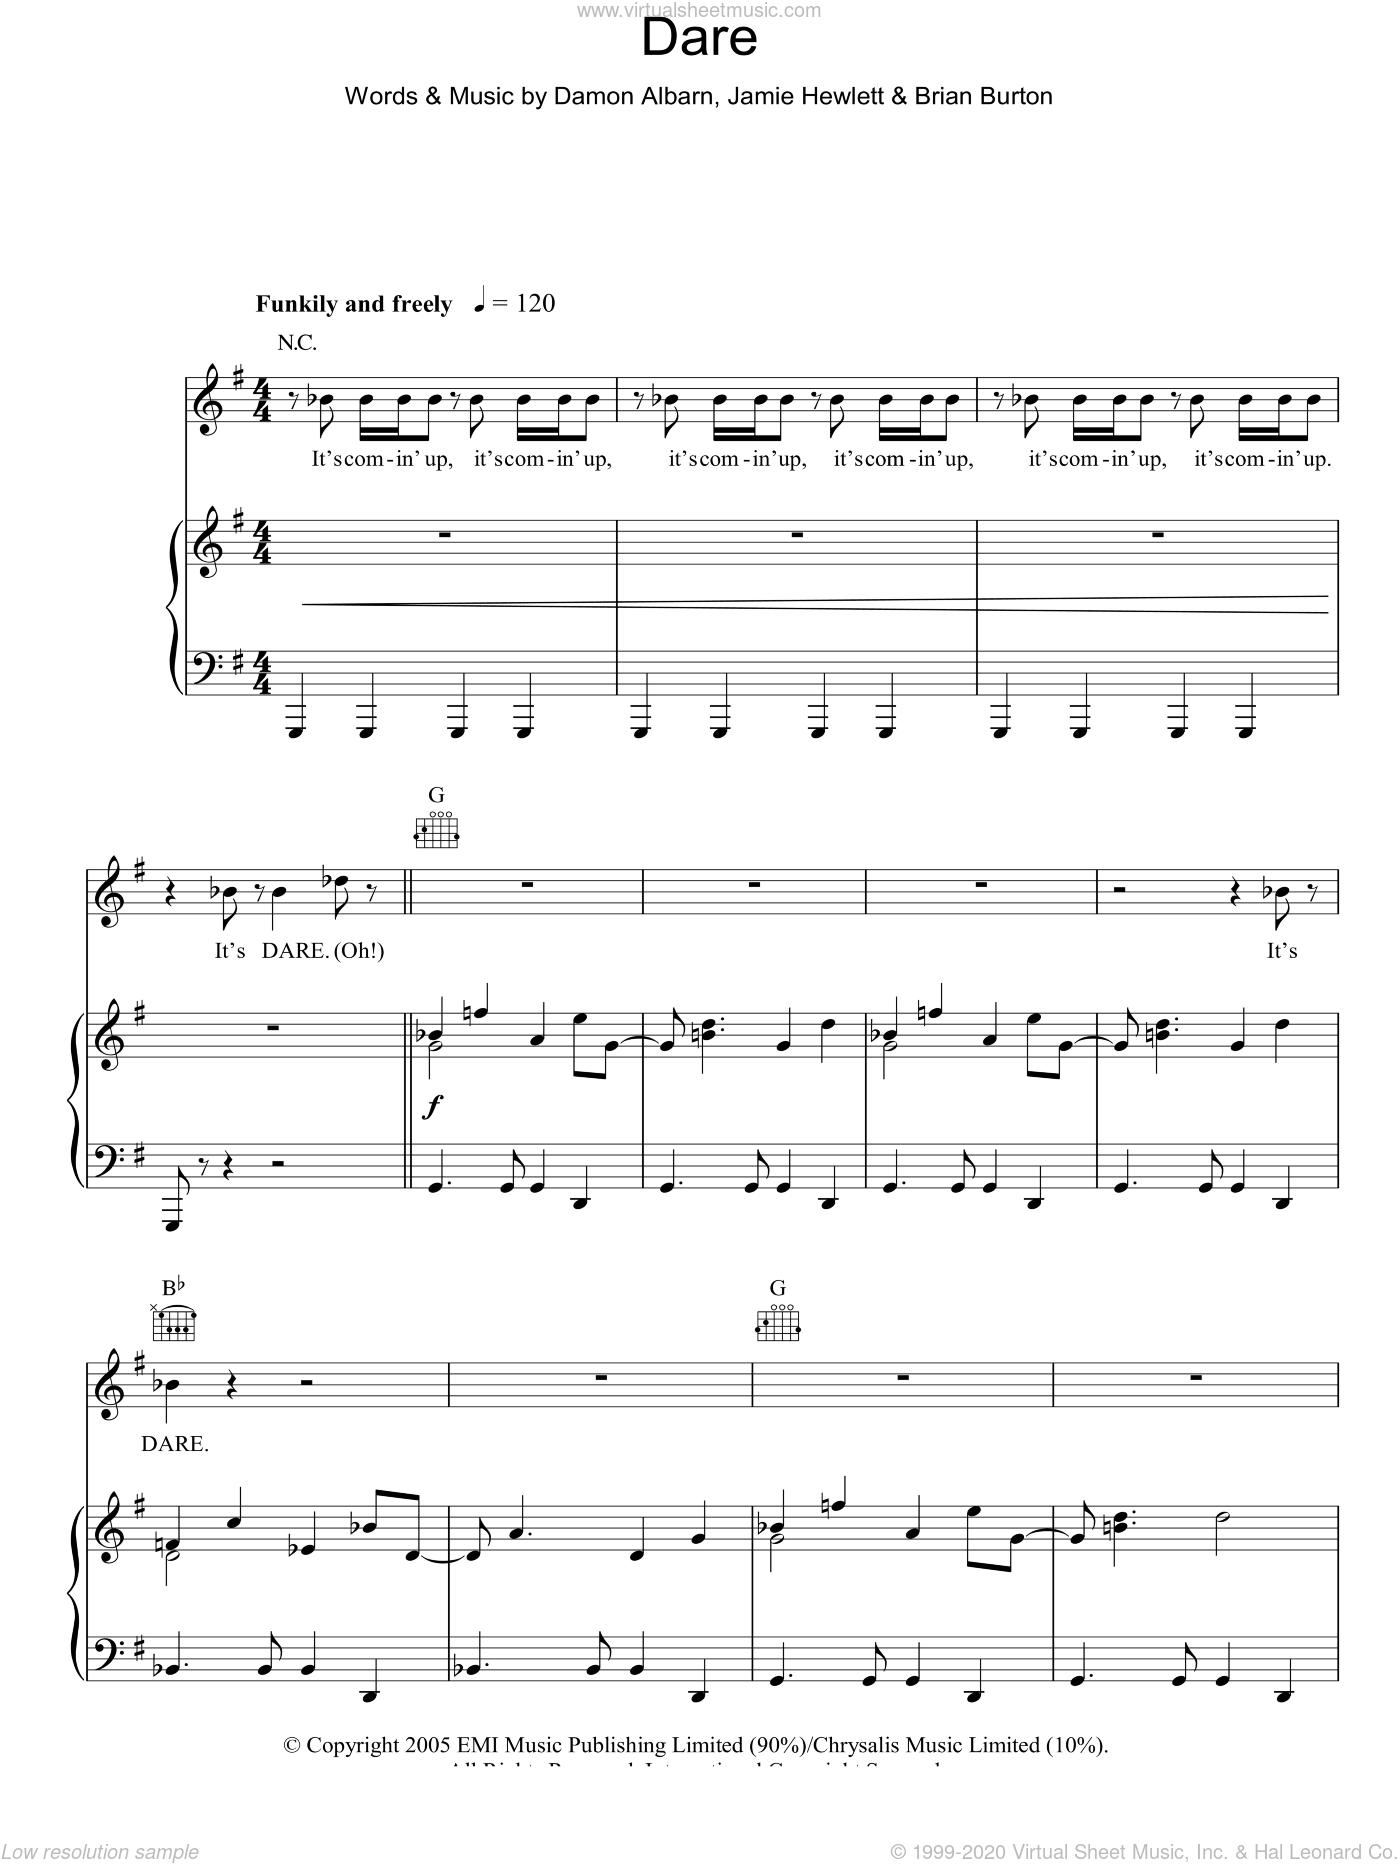 Dare sheet music for voice, piano or guitar by Gorillaz, Brian Burton, Damon Albarn and Jamie Hewlett, intermediate skill level